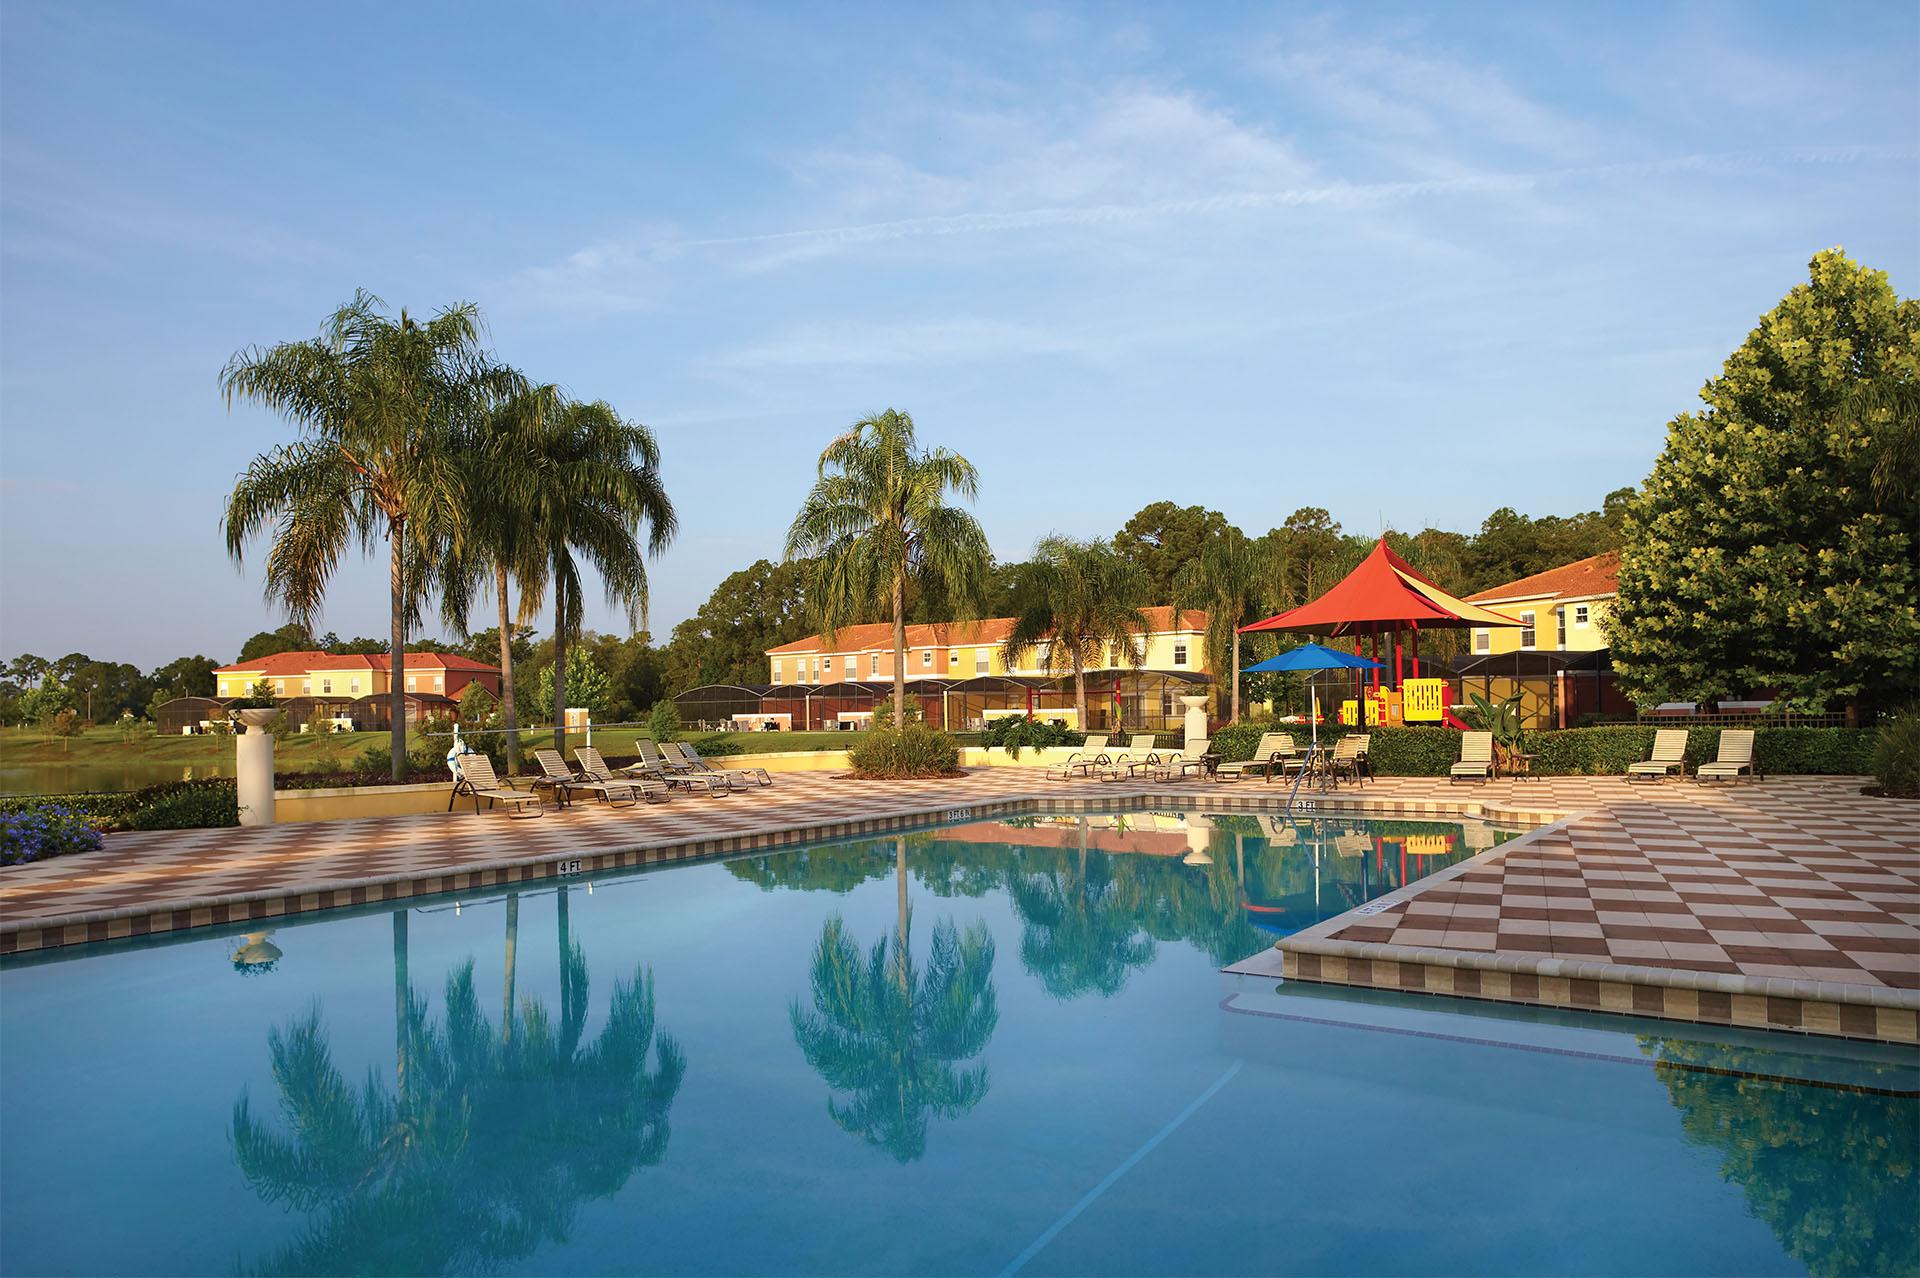 Encantada - Kissimmee, Florida